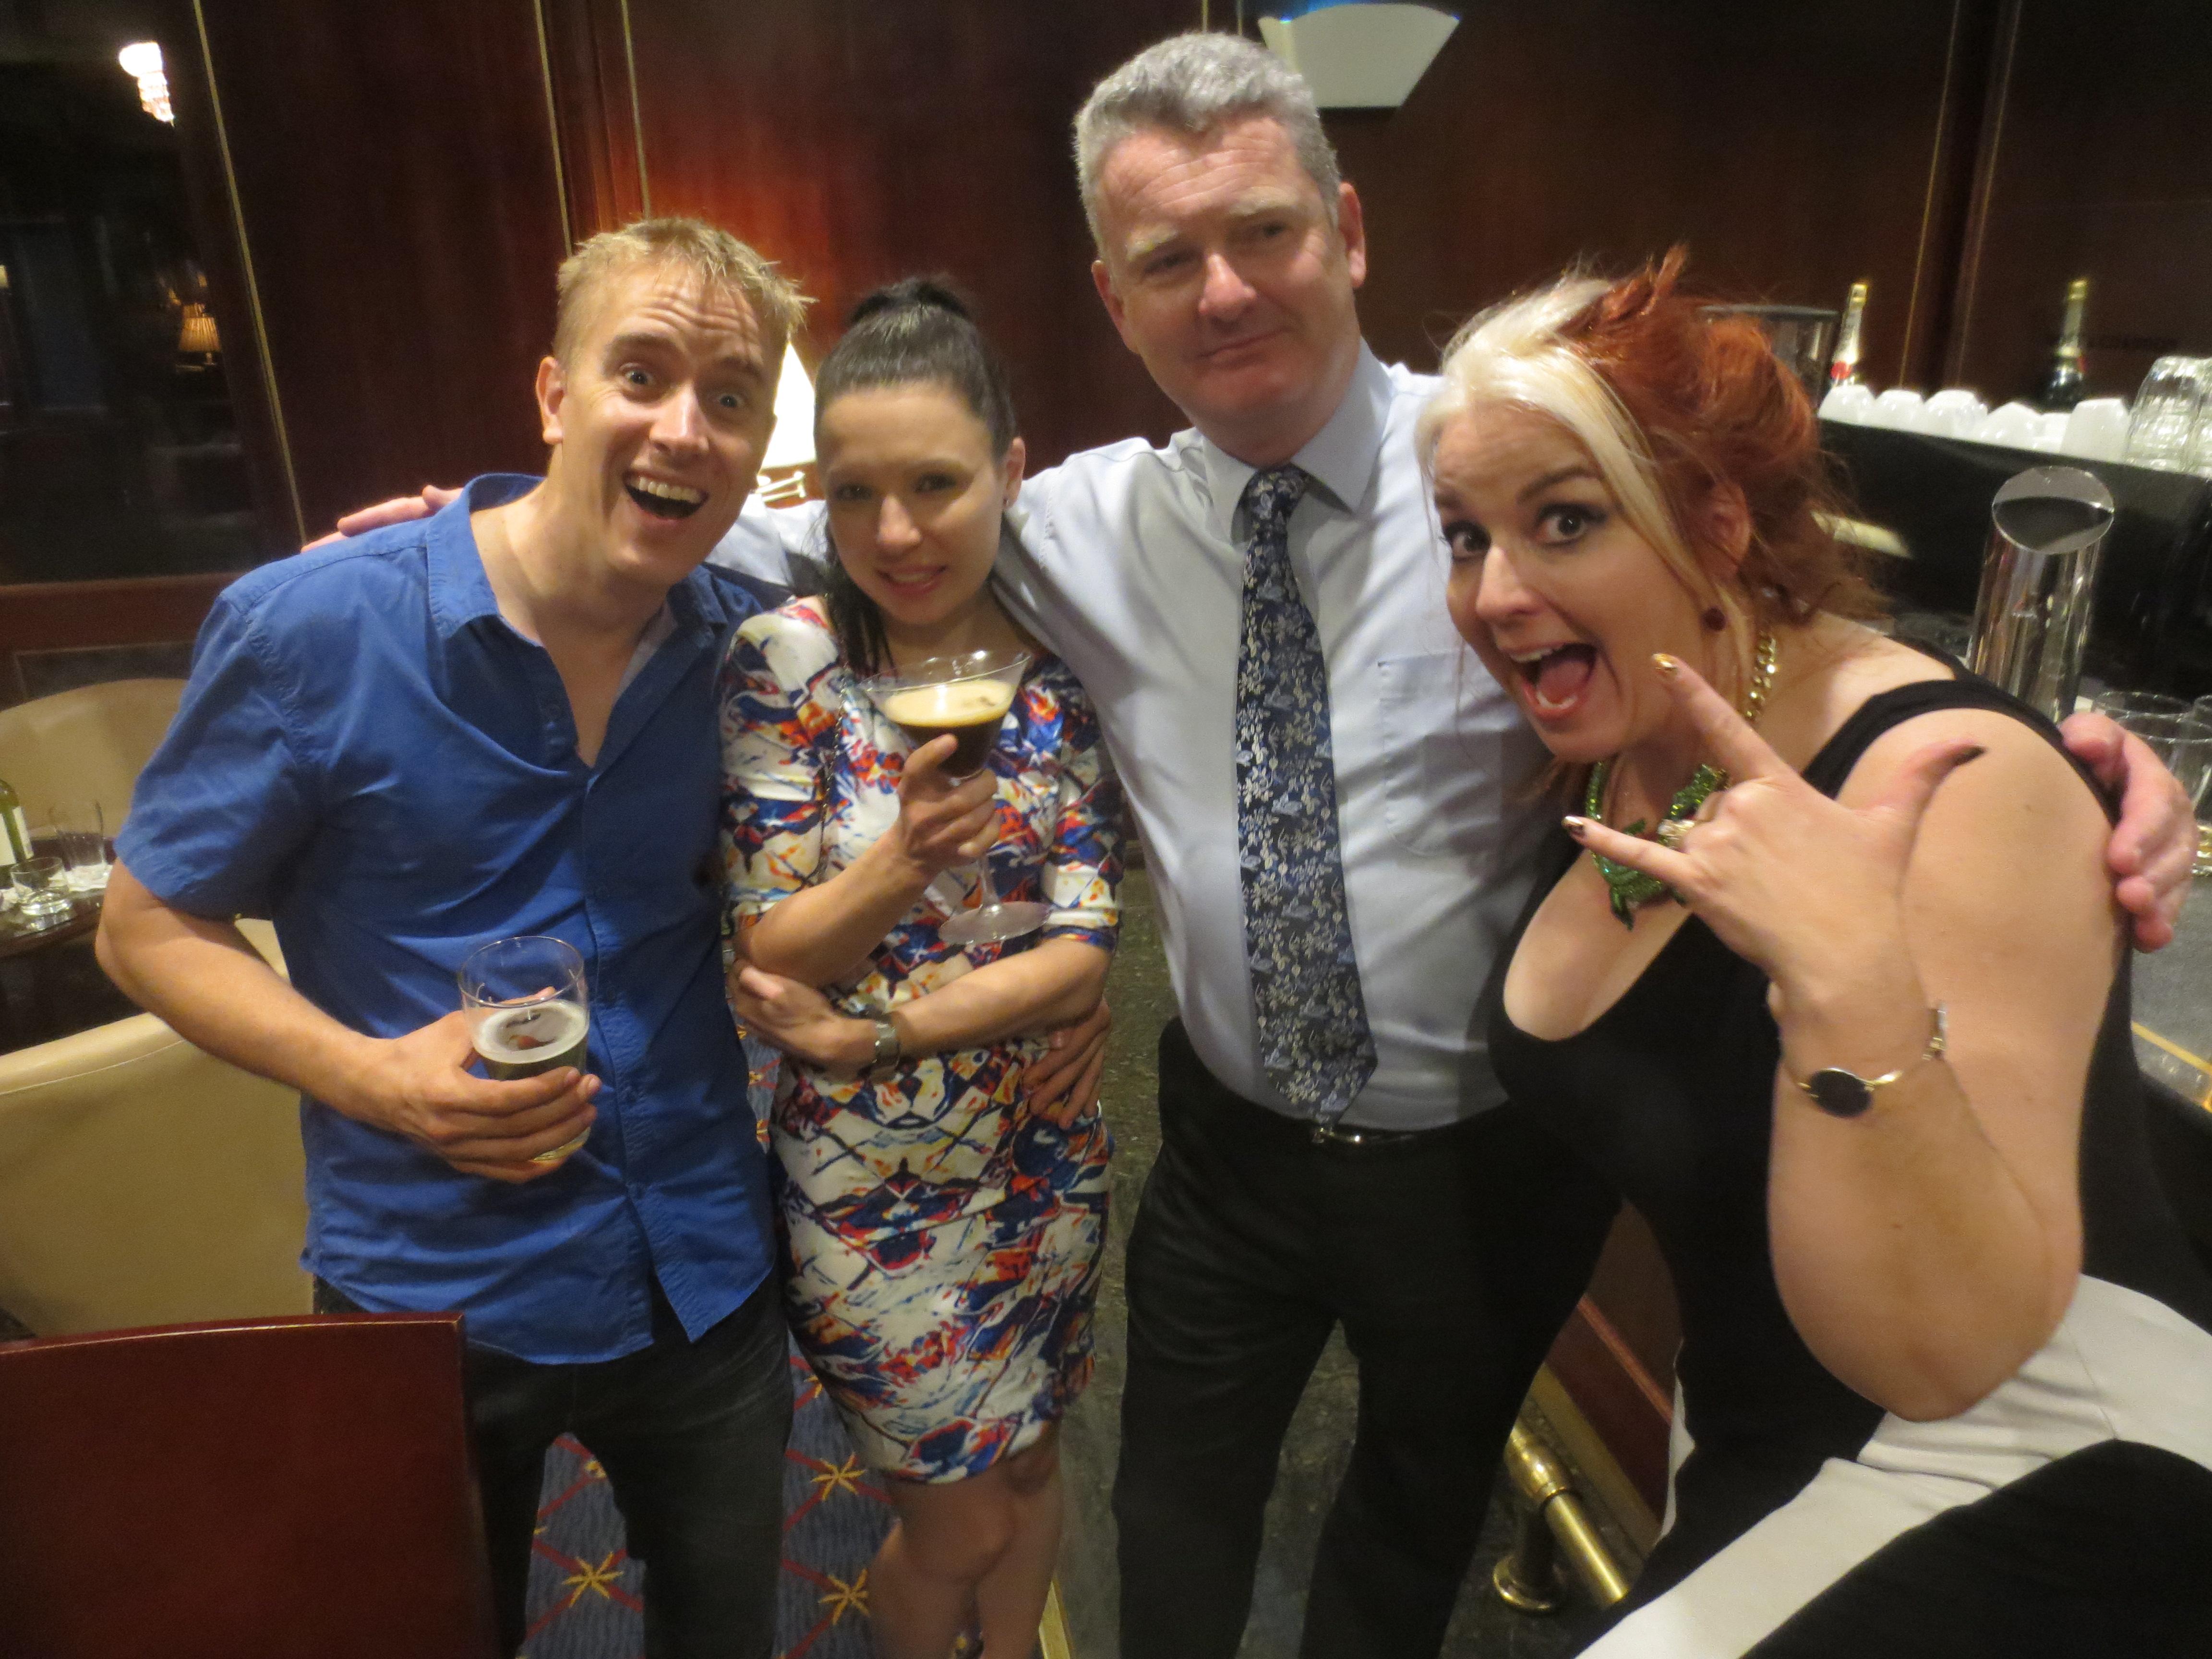 Brisbane Skeptics 20154